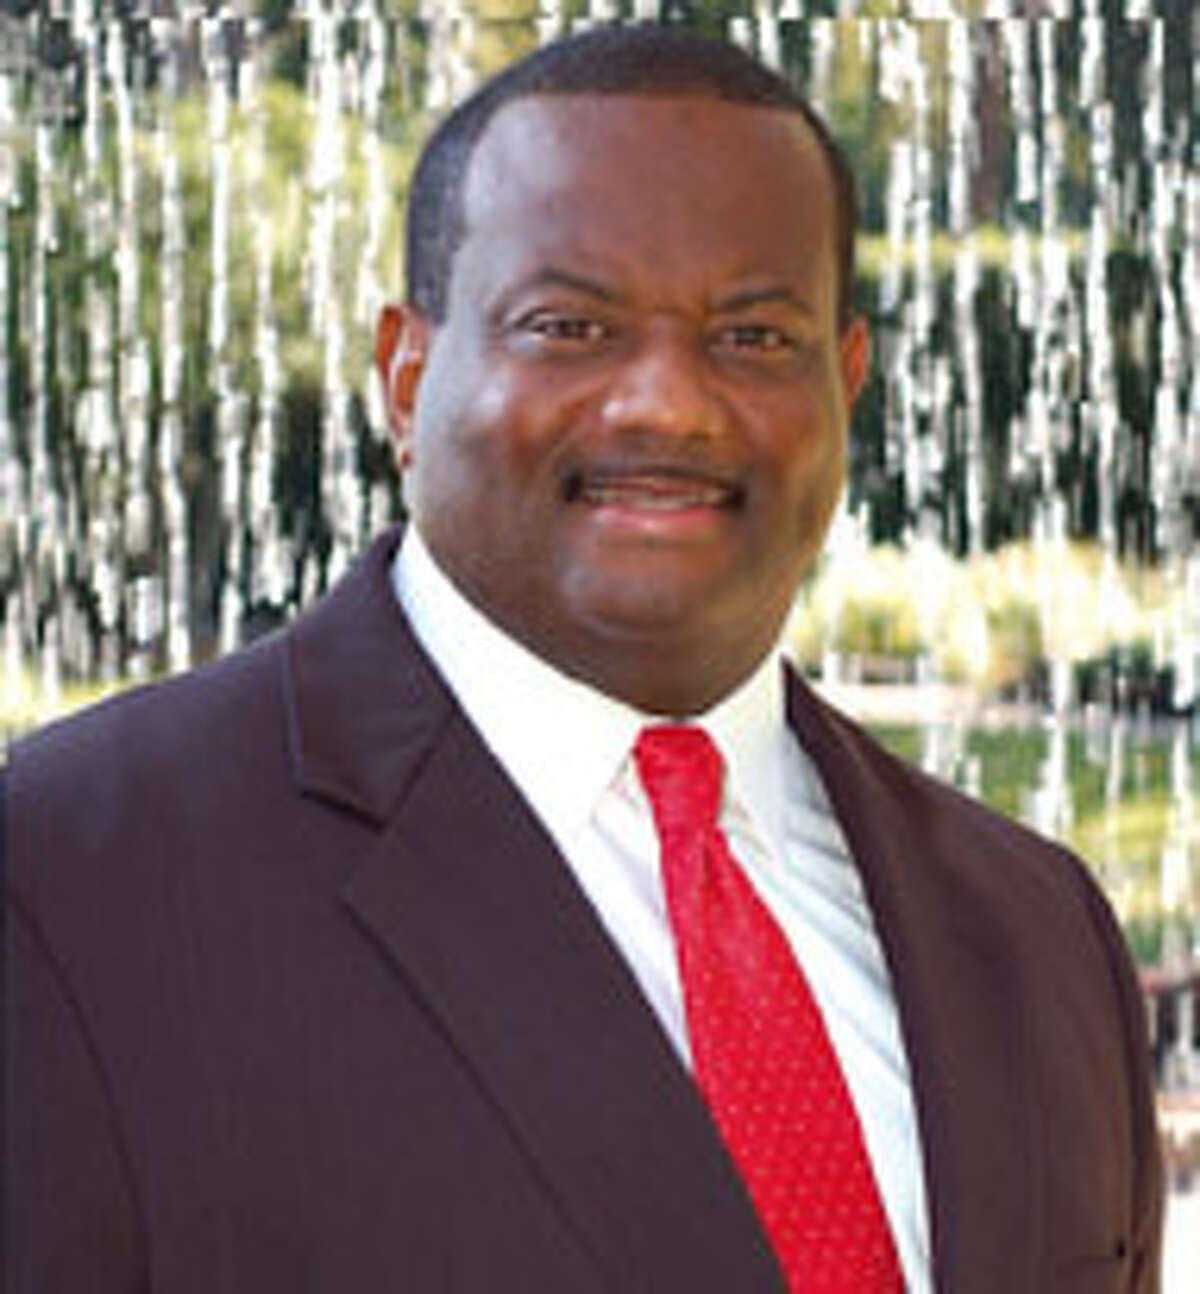 Carl Pittman, Republican candidate for Harris County Sheriff.